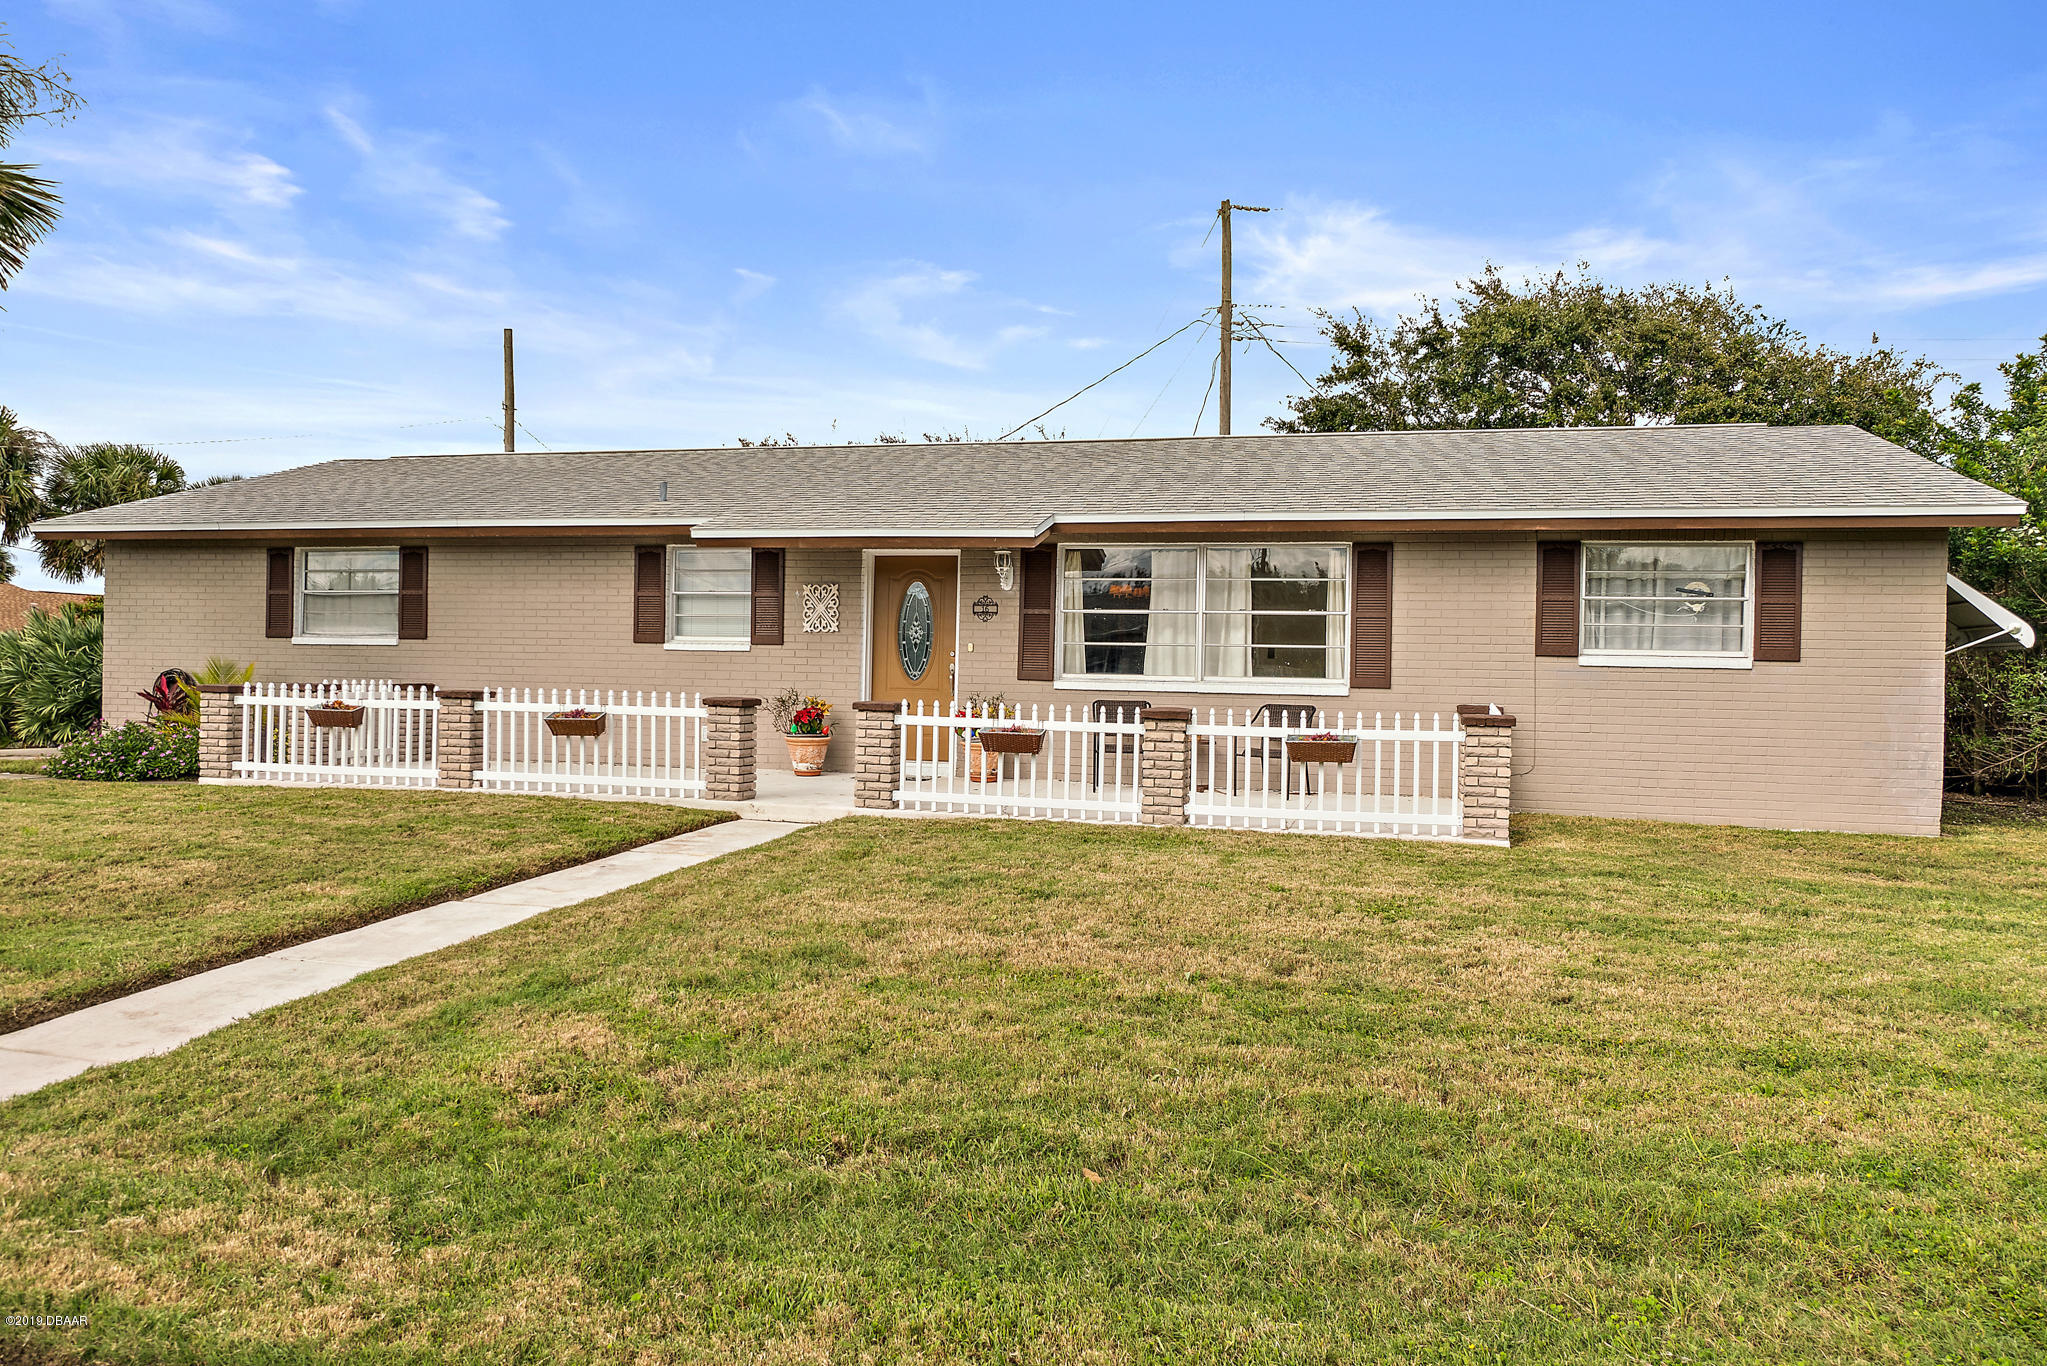 16  Starlight Drive, Ormond-By-The-Sea in Volusia County, FL 32176 Home for Sale